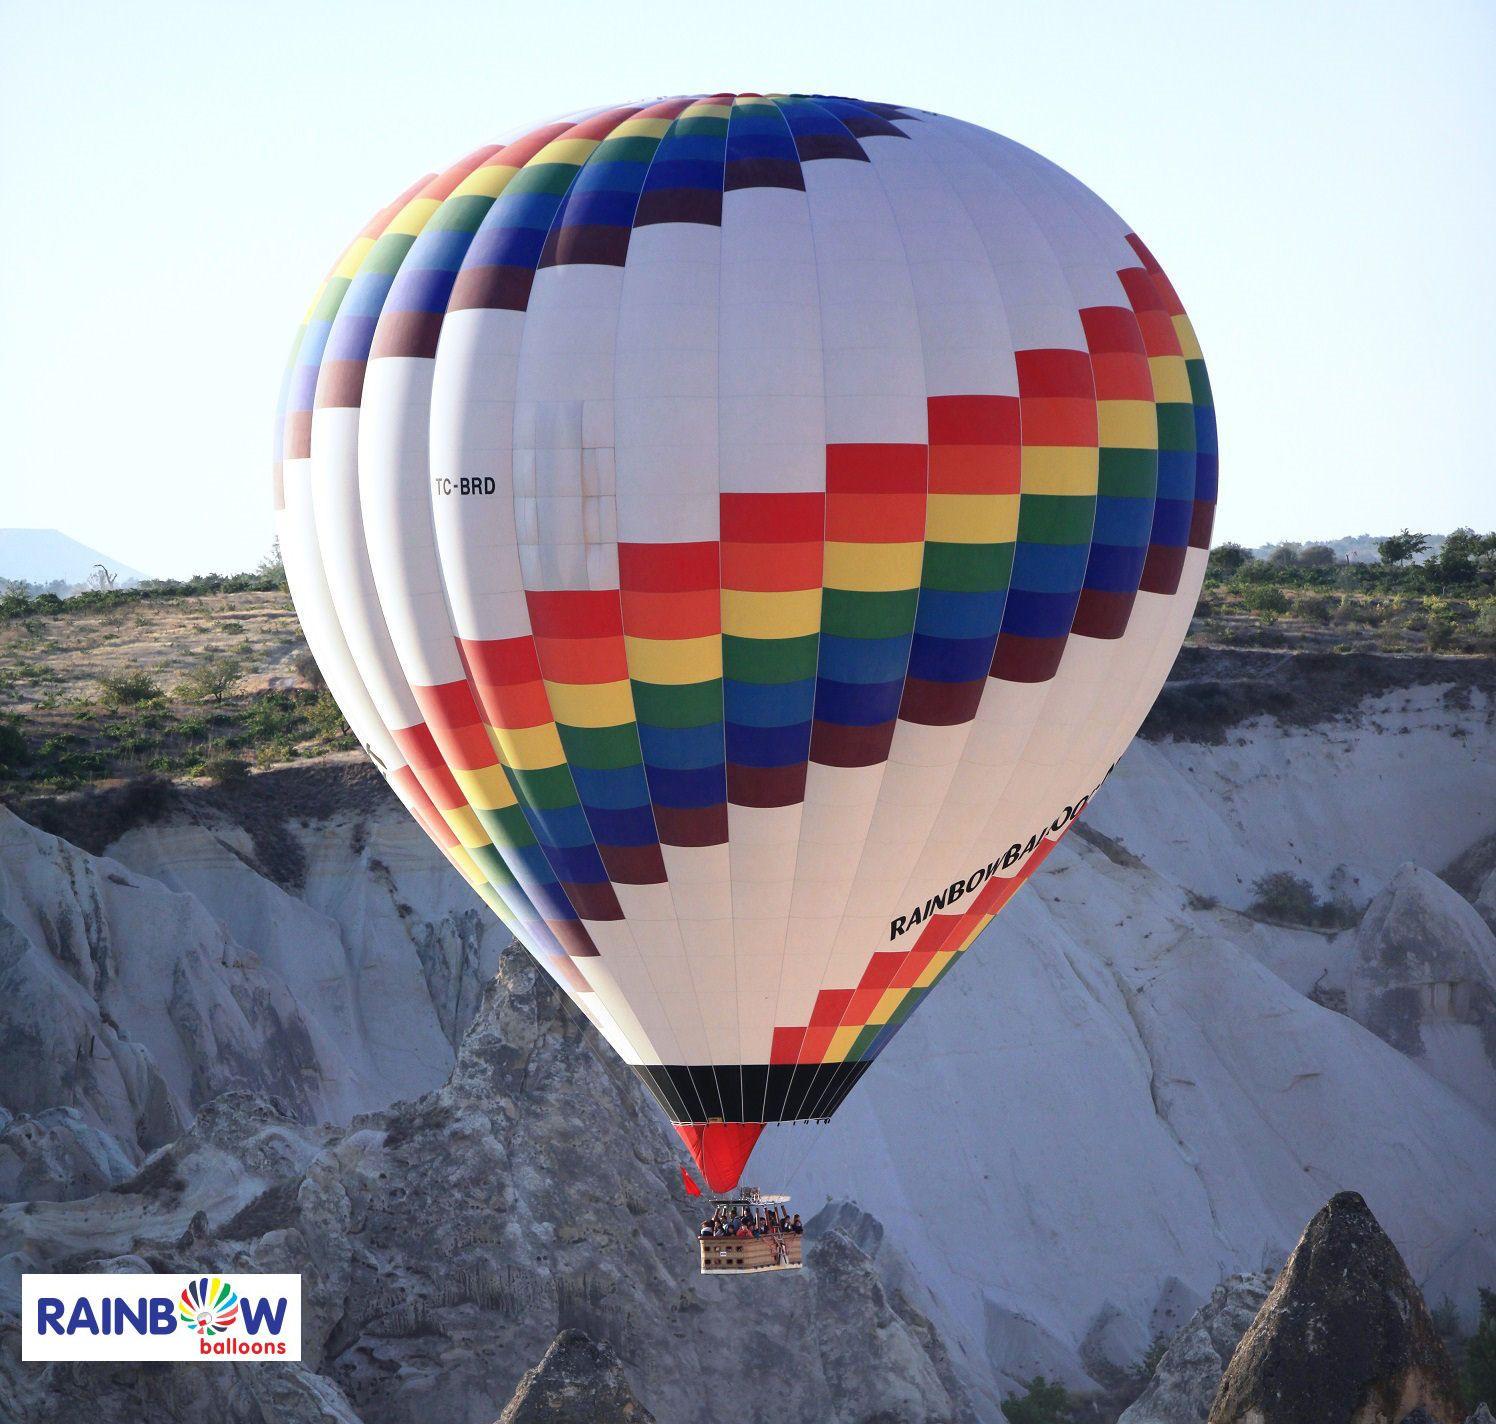 #Rainbowballoons #Balloon #Hotair #Cappadocia #Morning #Turkey #Trip #Sunrise #G…